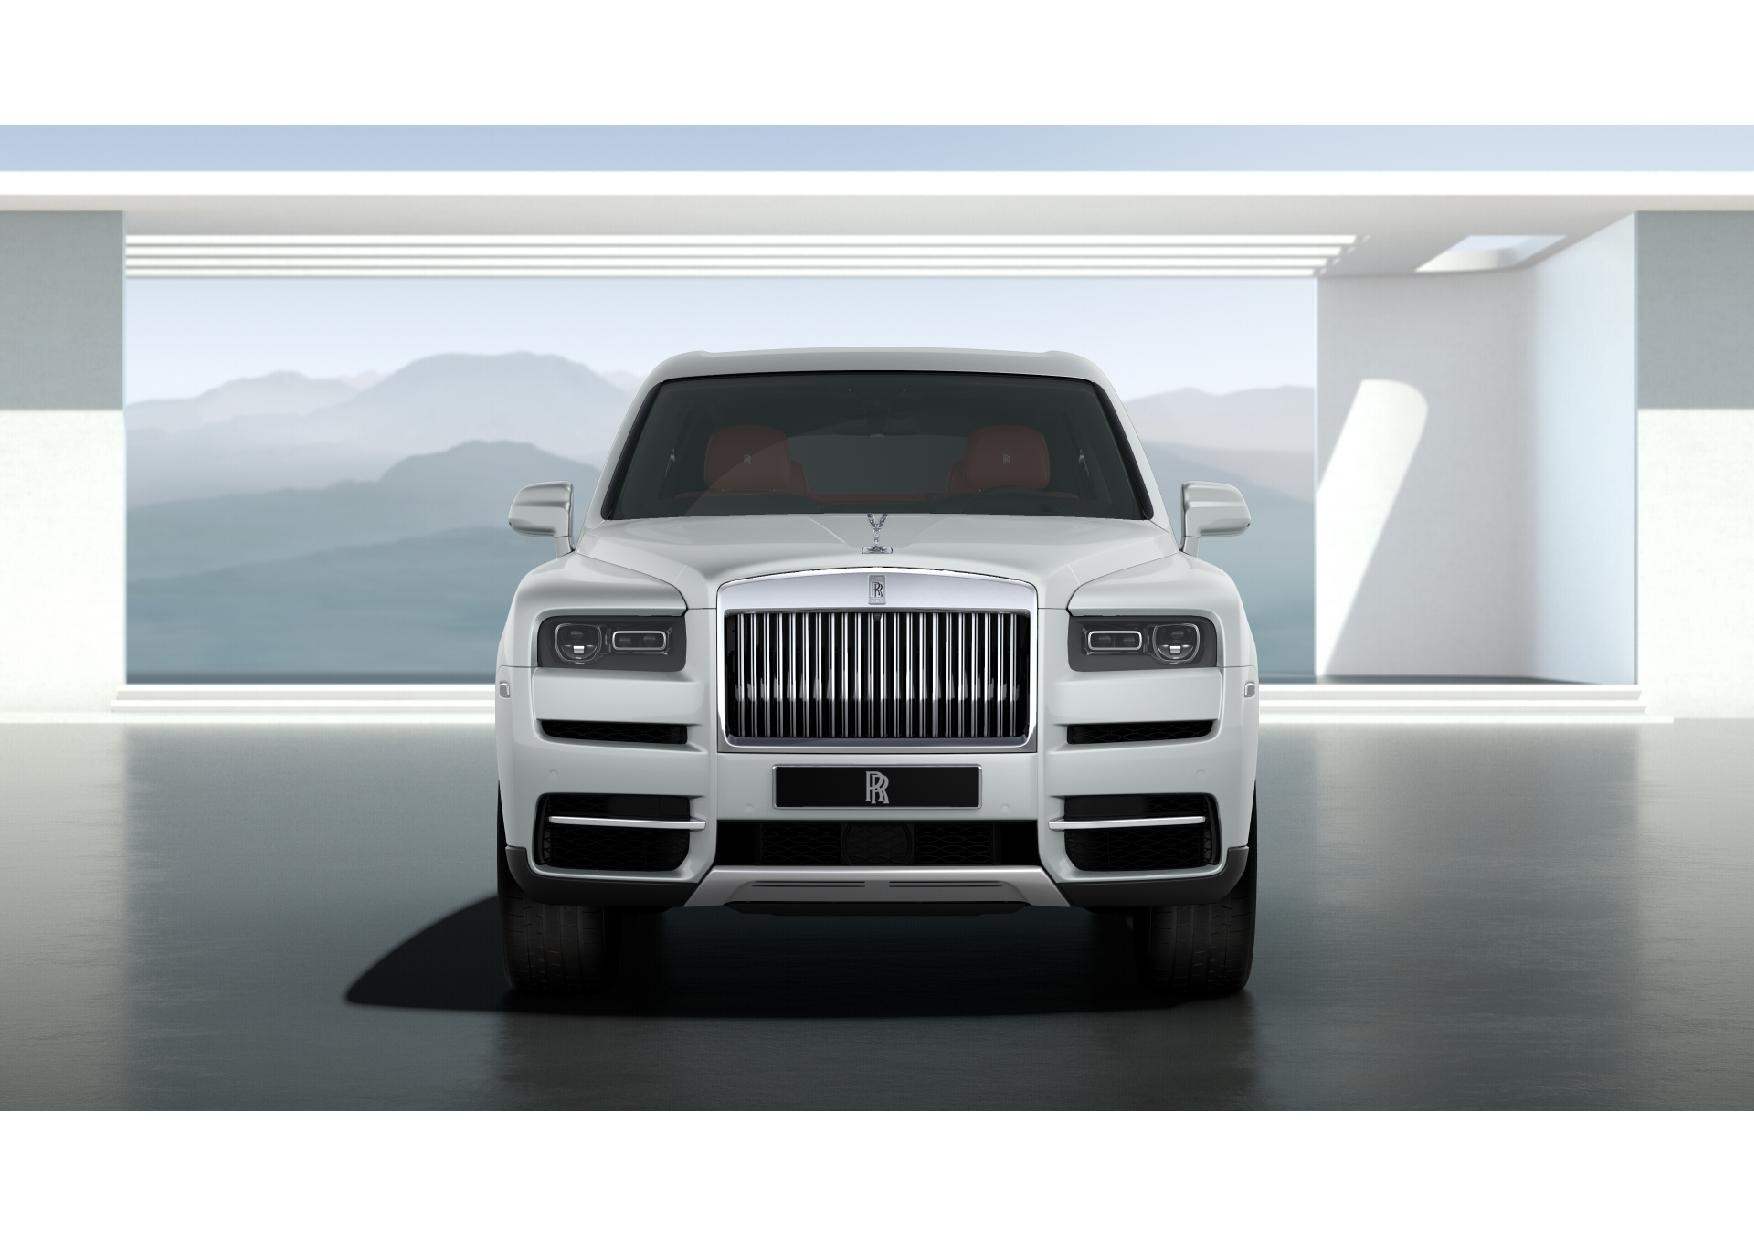 New 2021 Rolls-Royce Cullinan for sale $383,850 at Bugatti of Greenwich in Greenwich CT 06830 1